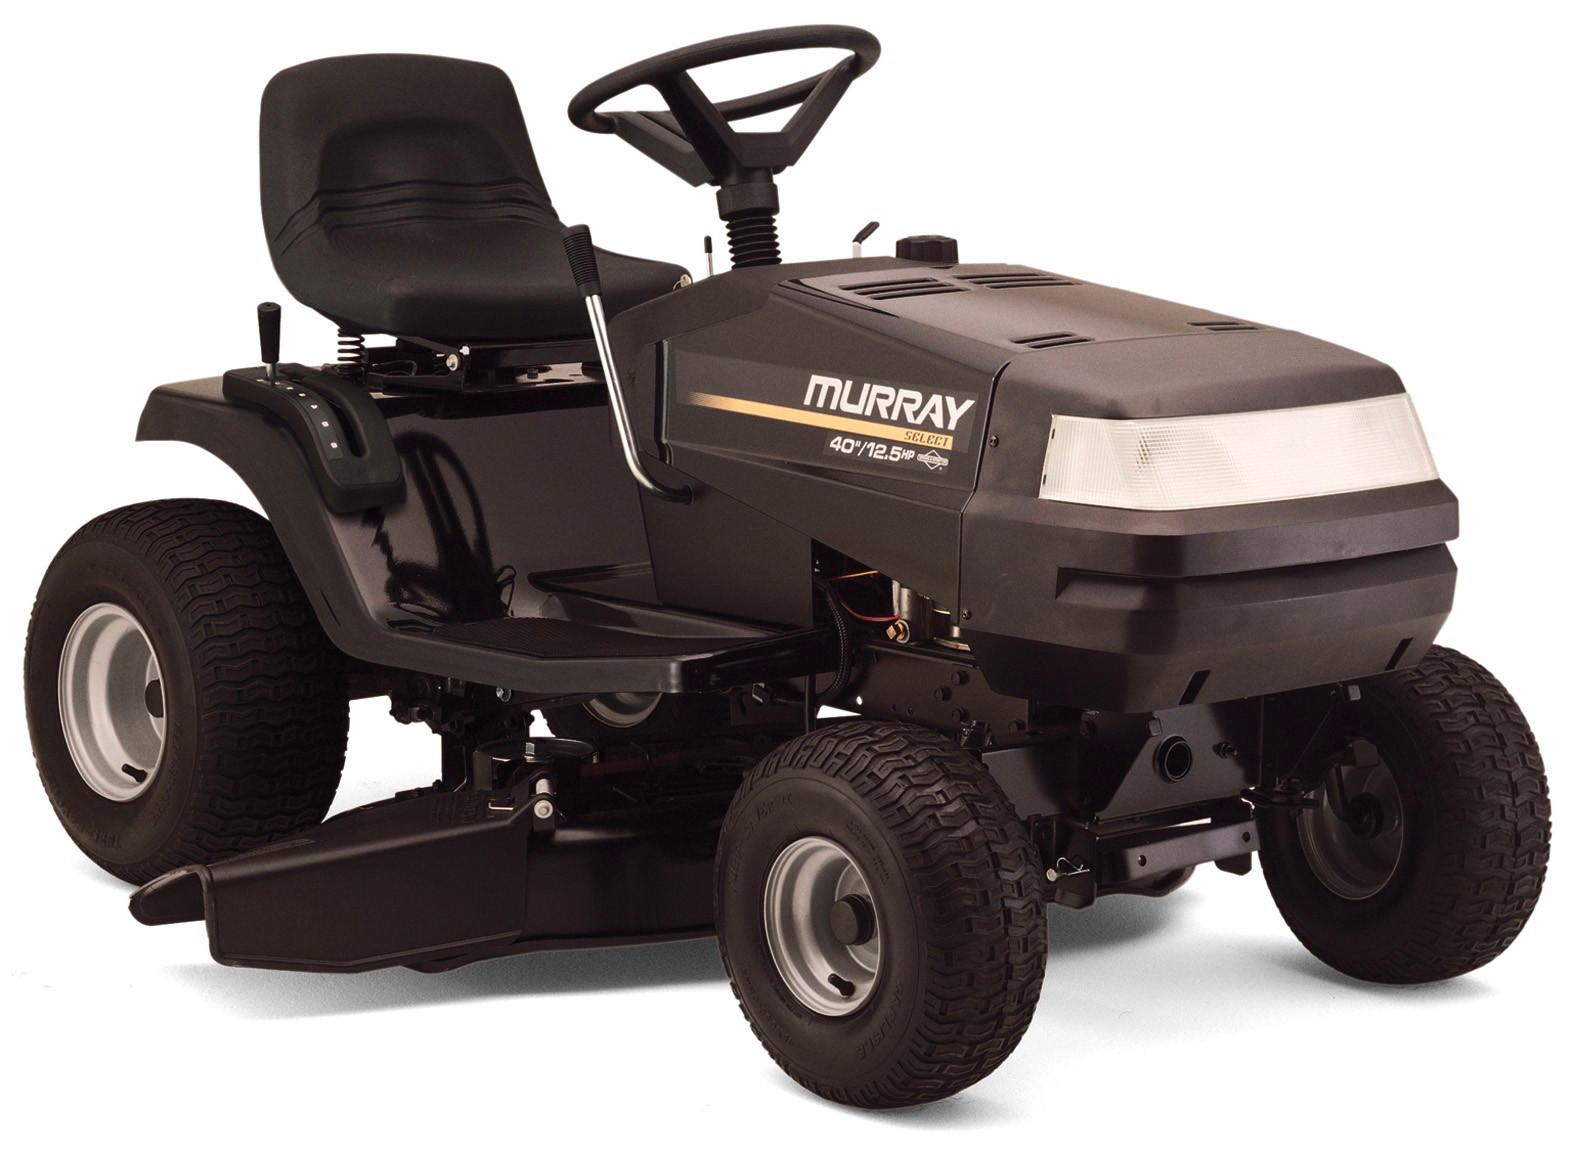 Murray Garden Tractor : Murray inc recall of lawn tractors